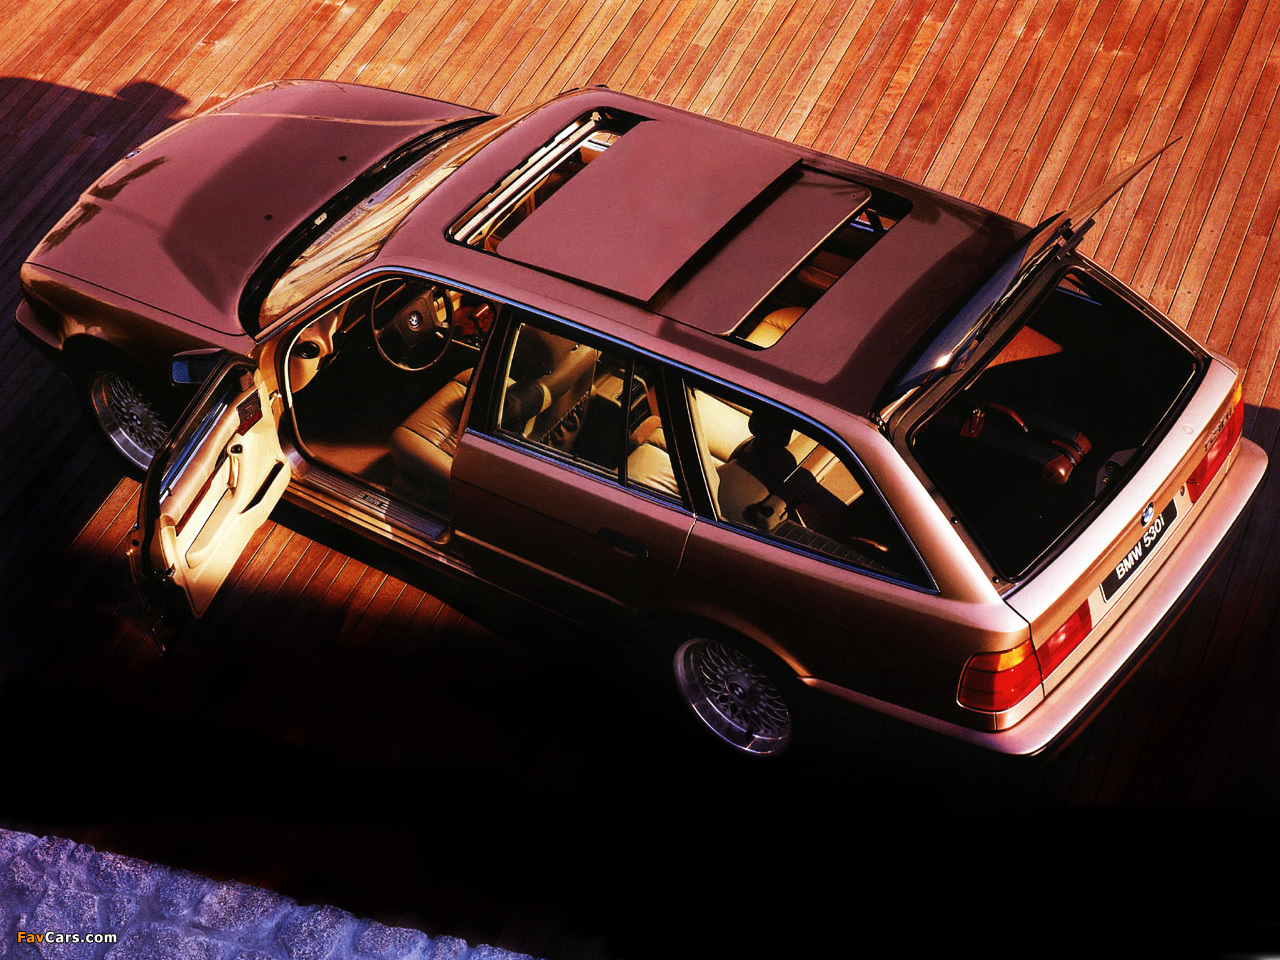 530i Touring E34 199296 wallpapers